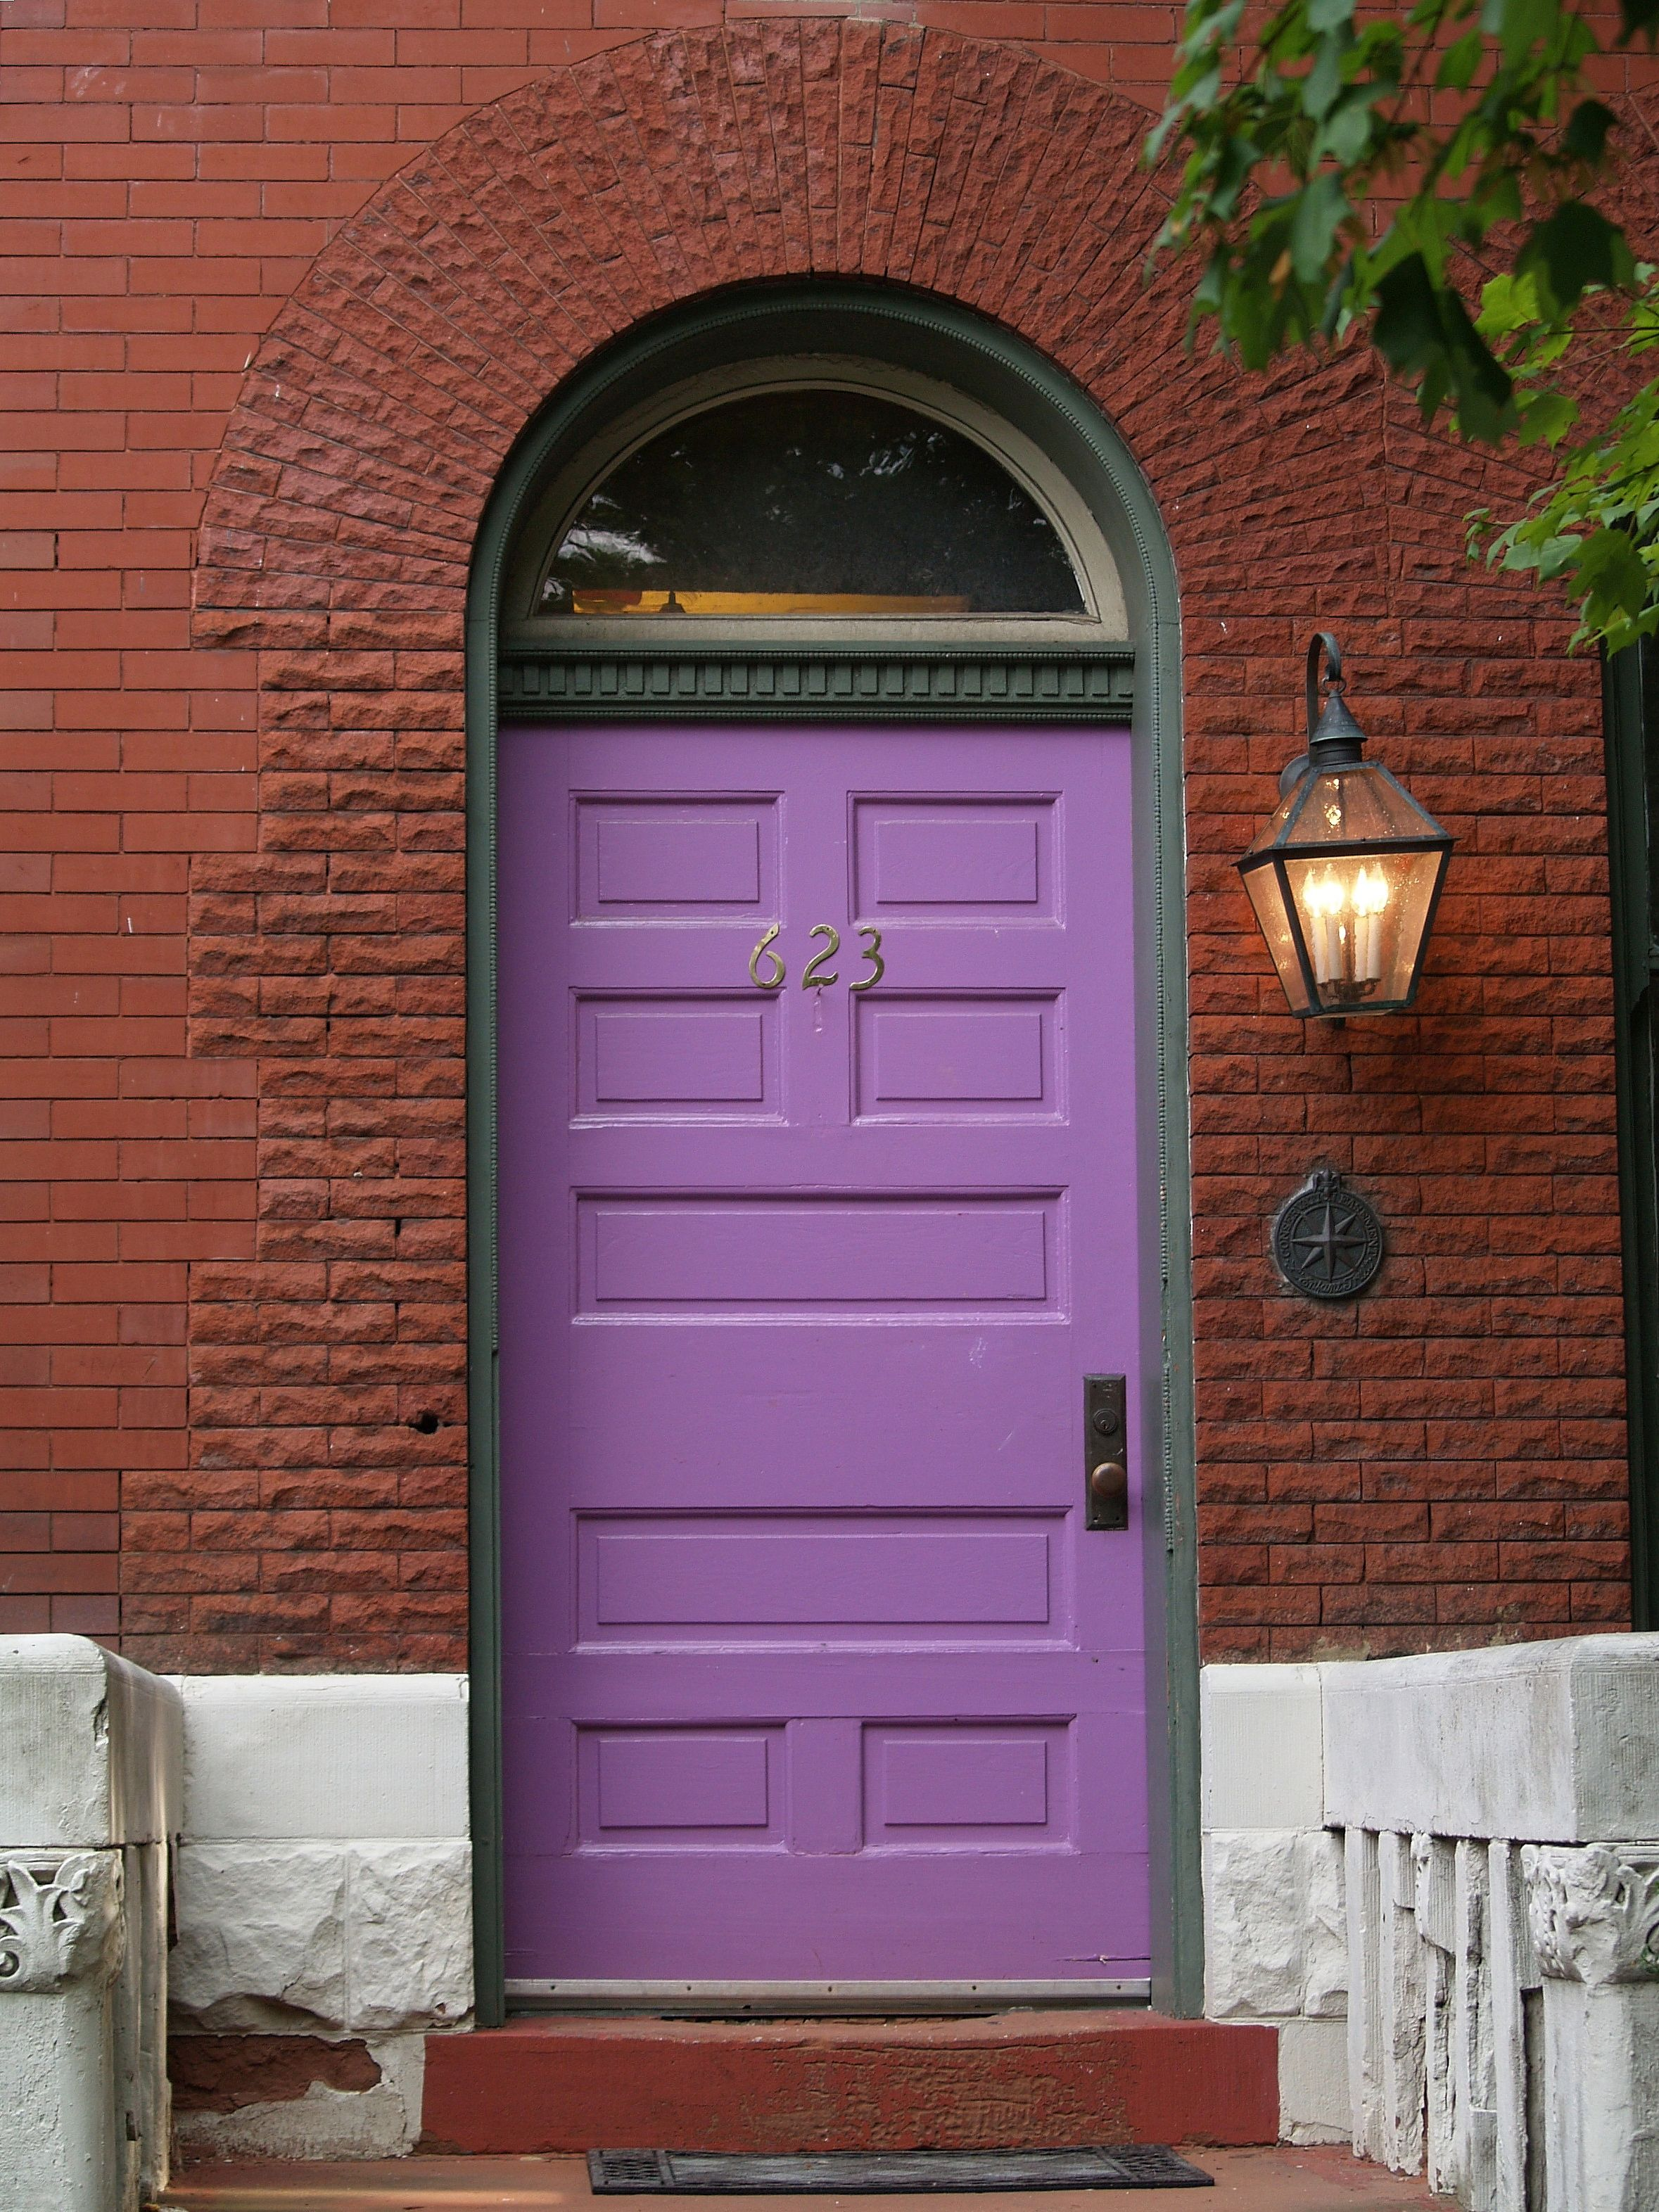 Doors & Purple Door Red Brick Arch LEnfant Trust Easement 623: Capitol ... pezcame.com